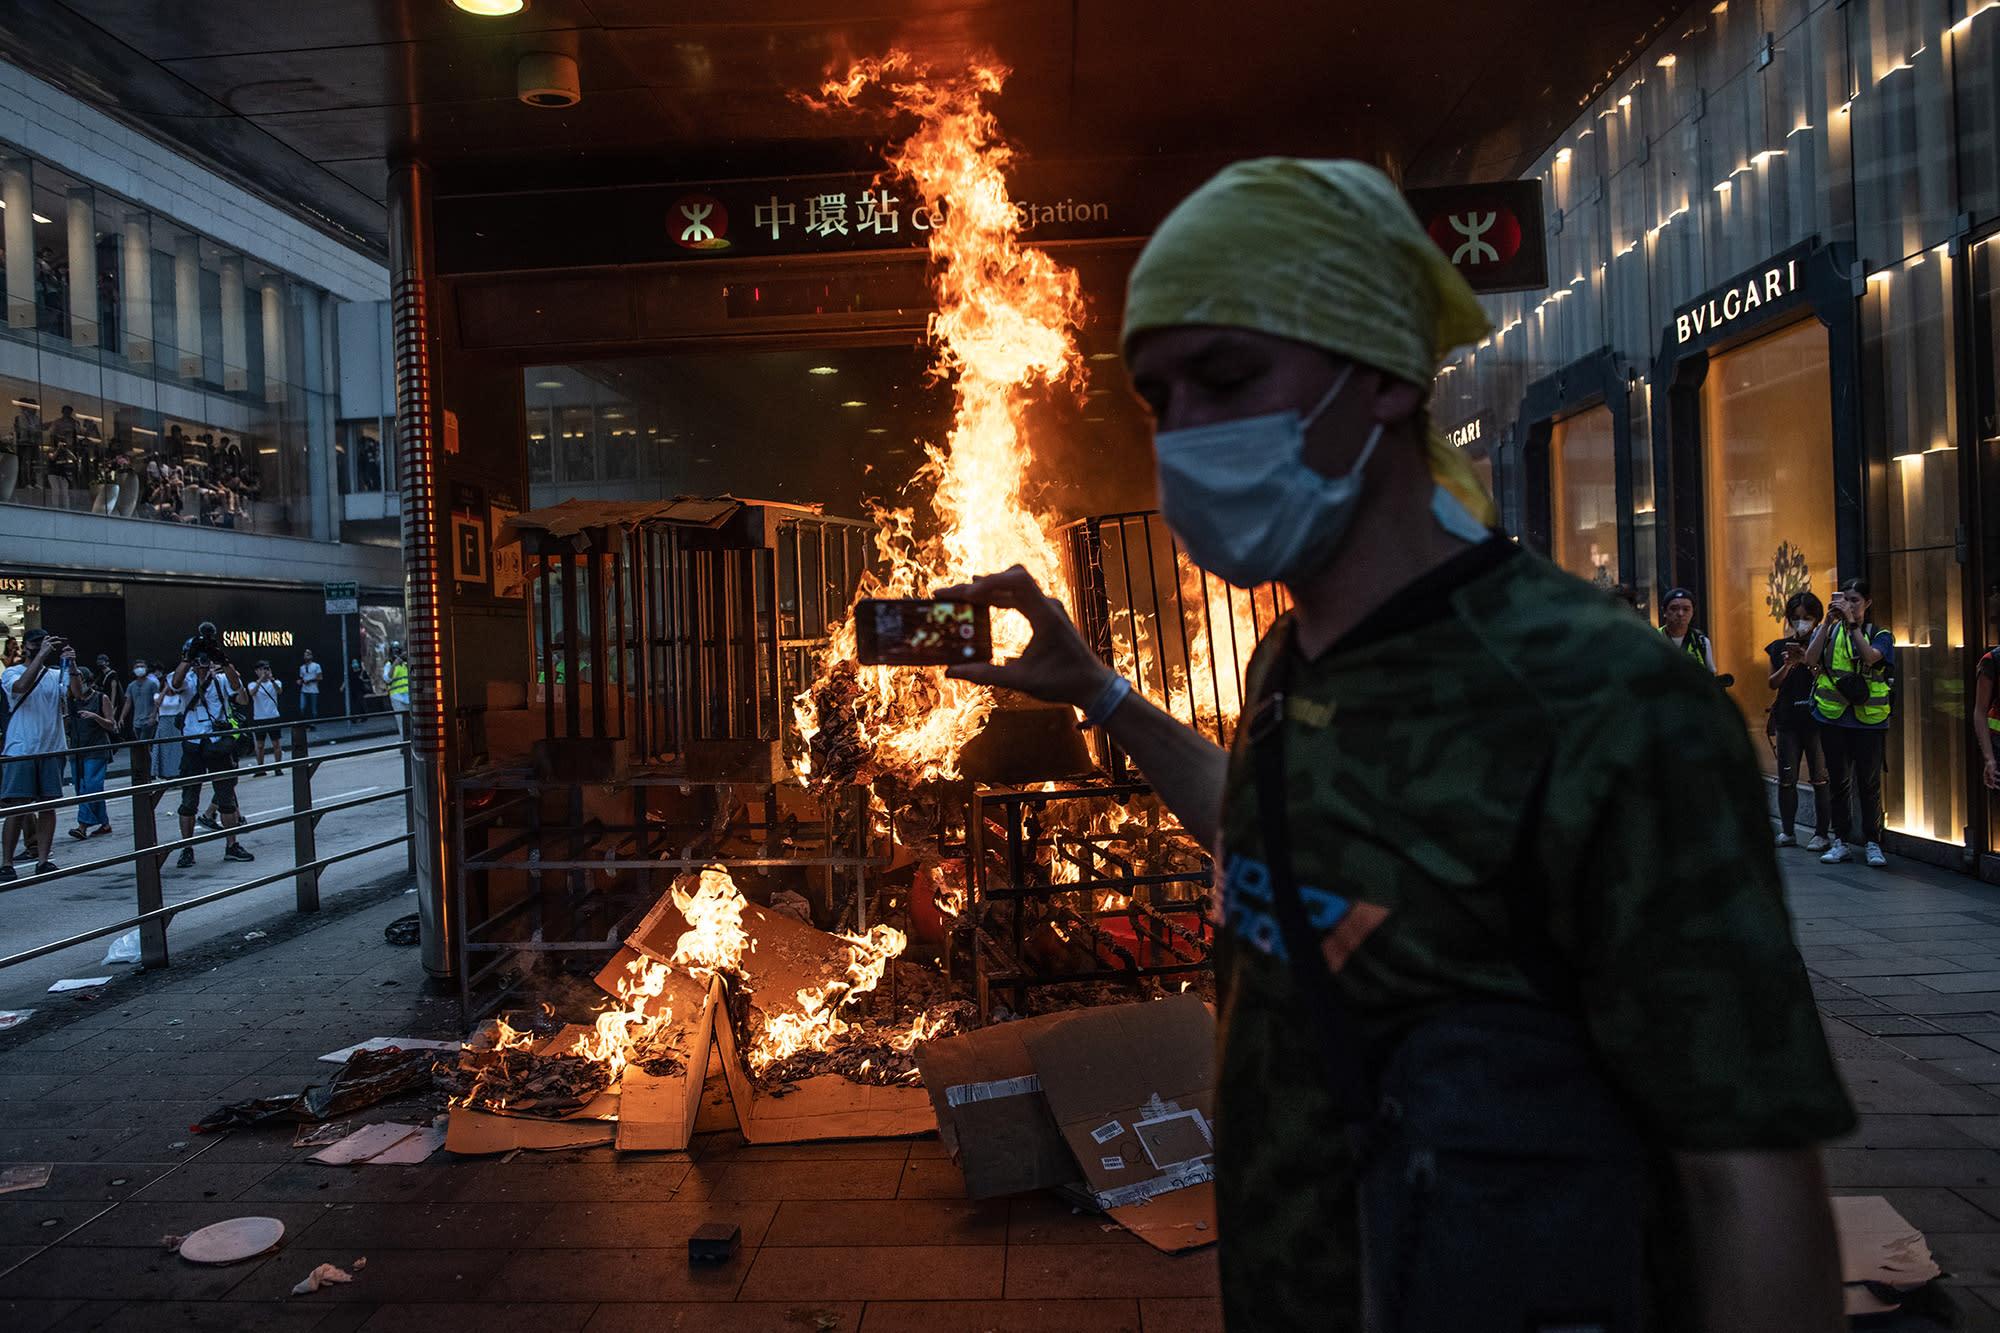 Police Fire Tear Gas, Protesters Start Blazes: Hong Kong Update